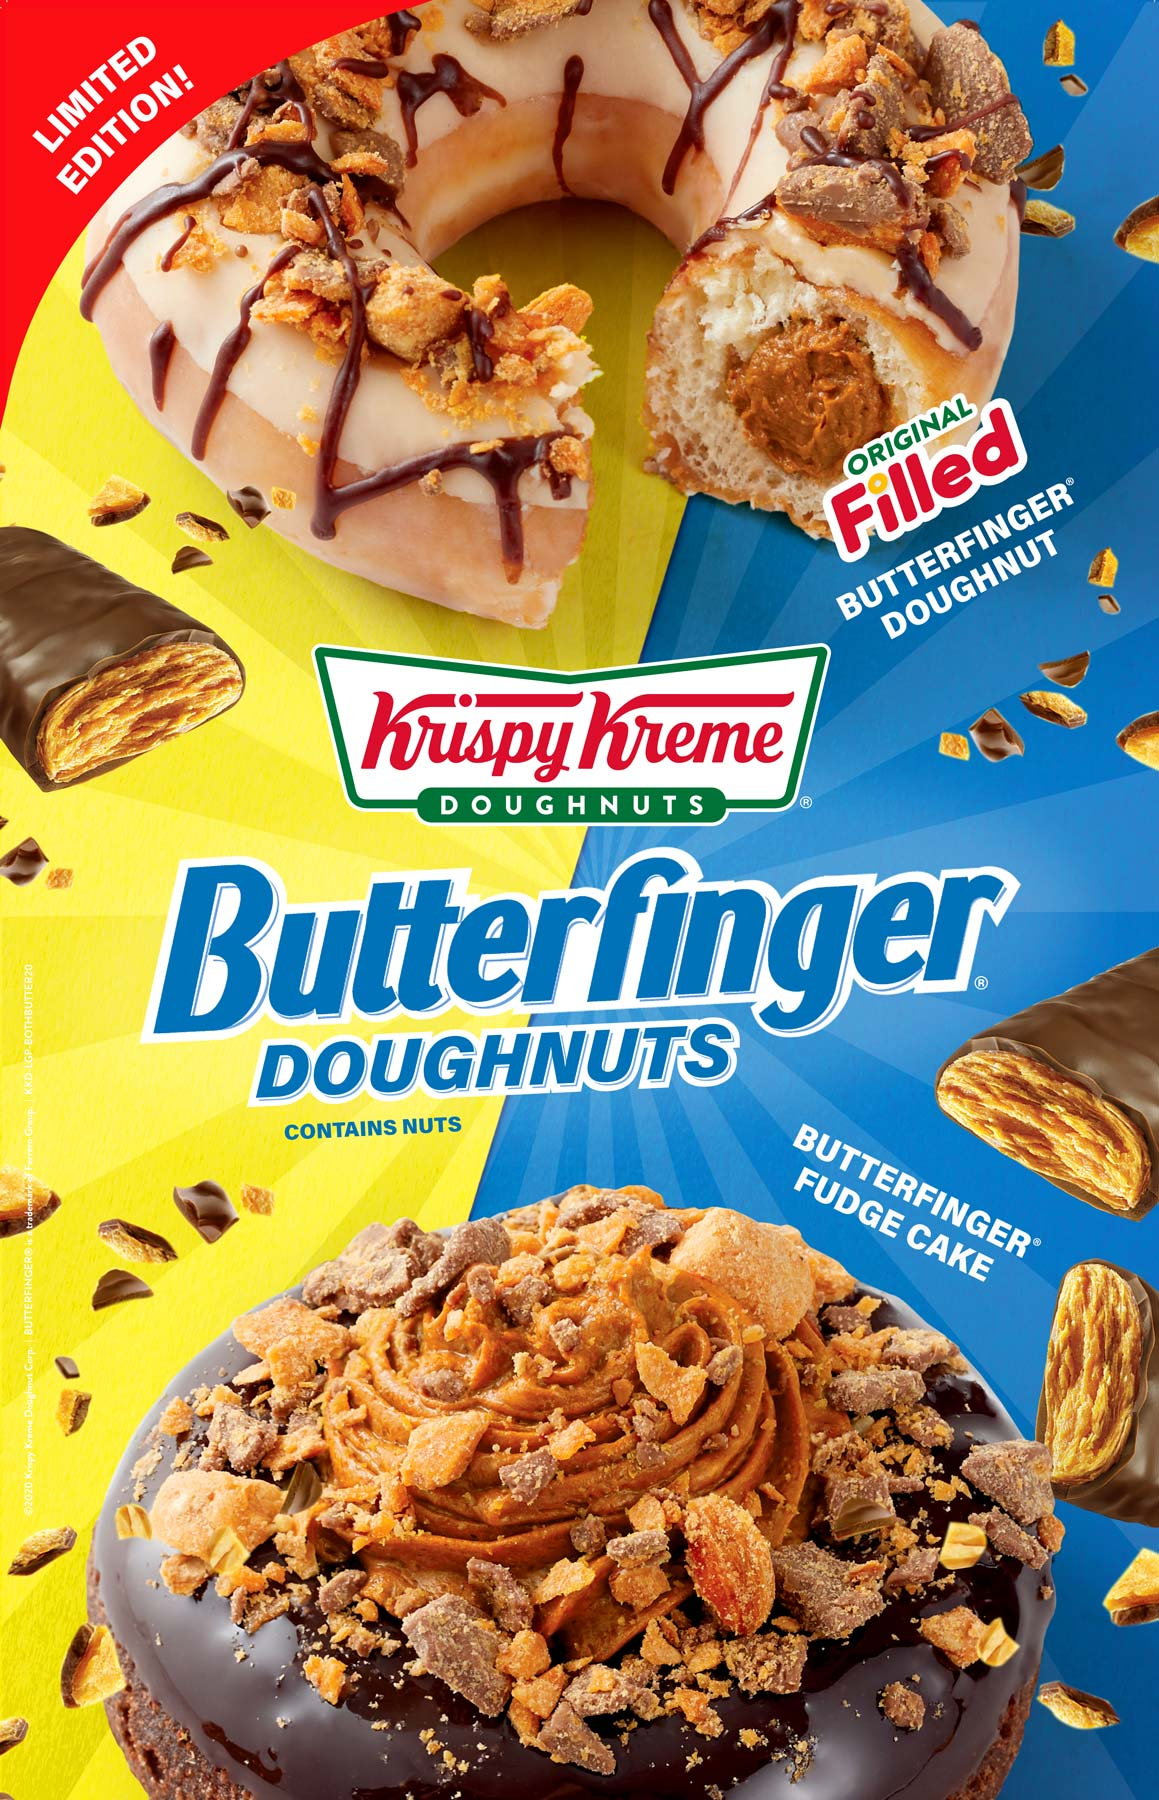 Krispy Kreme Doughnuts Butterfinger Tear Sheet by Salt Paper Studio of Charlotte, NC